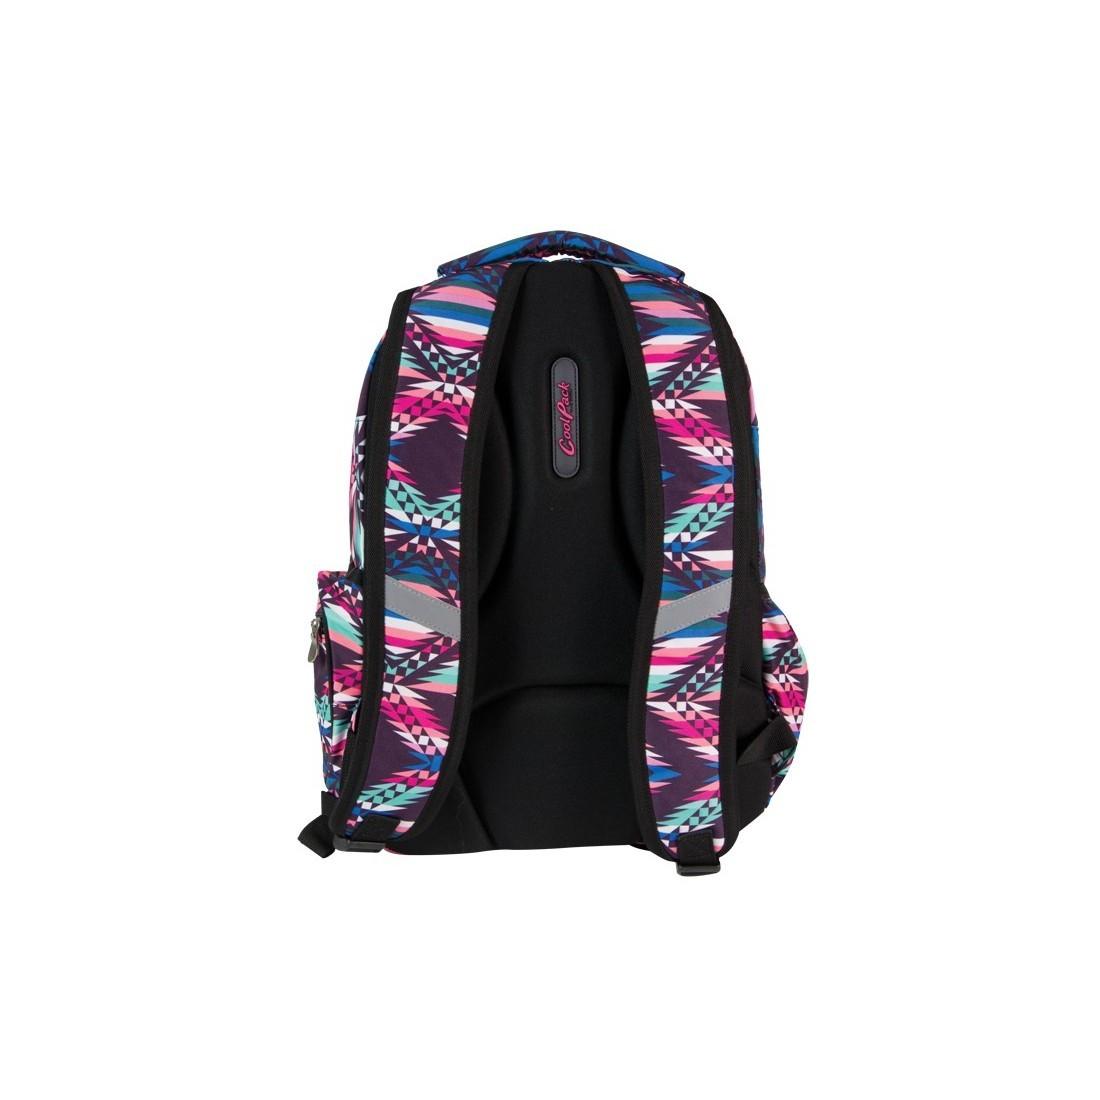 PLECAK MŁODZIEŻOWY COOLPACK BREAK PINK MEXICO CP 270 - plecak-tornister.pl